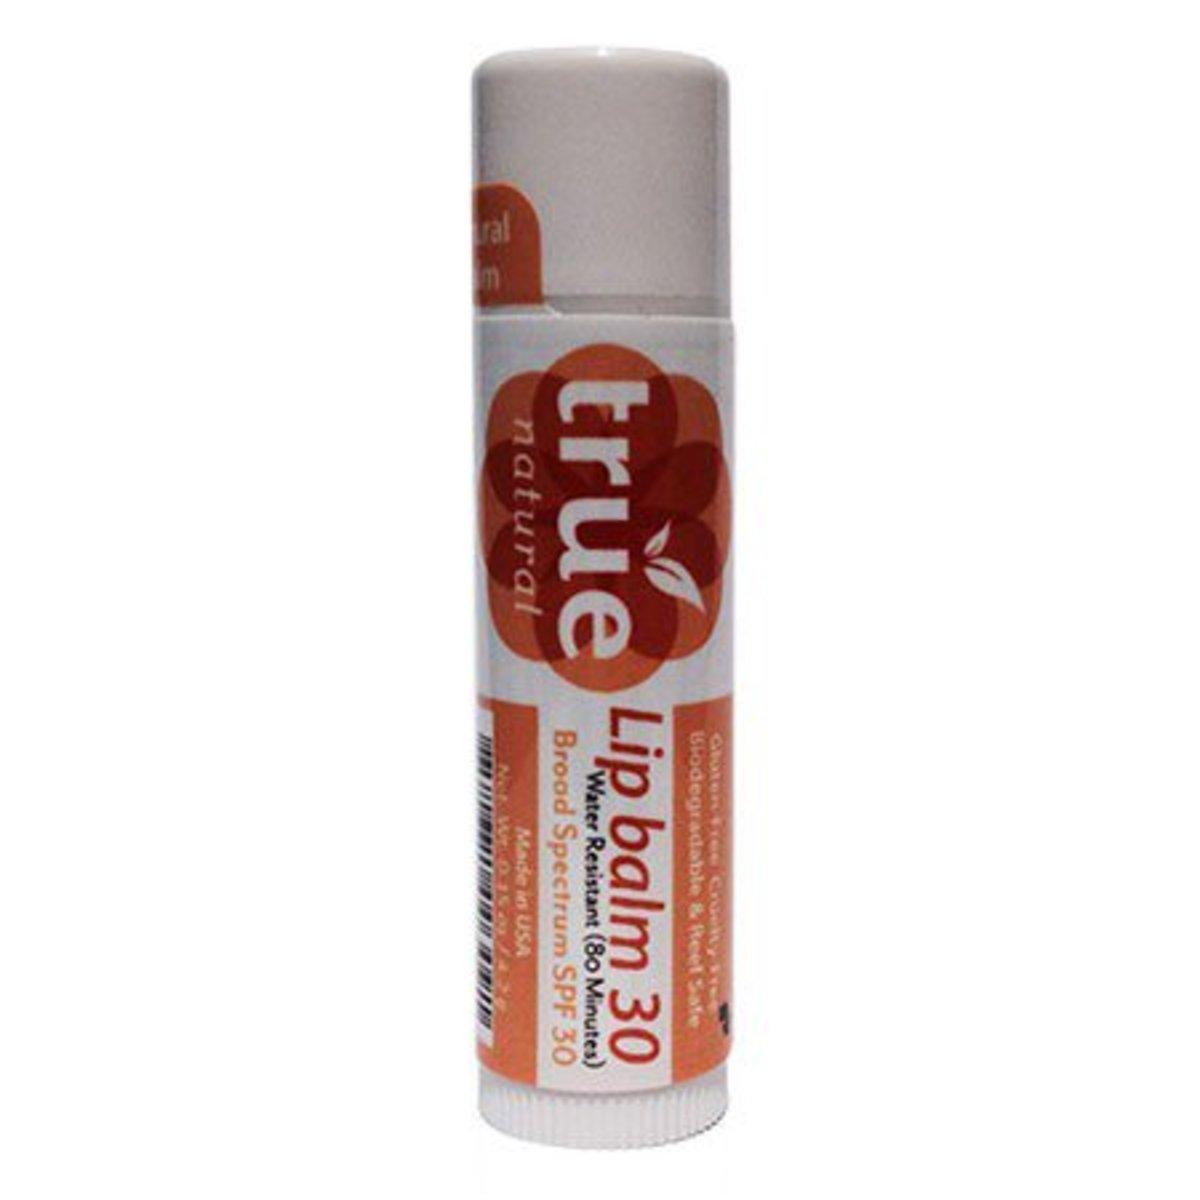 True Natural Lip Balm SPF 30